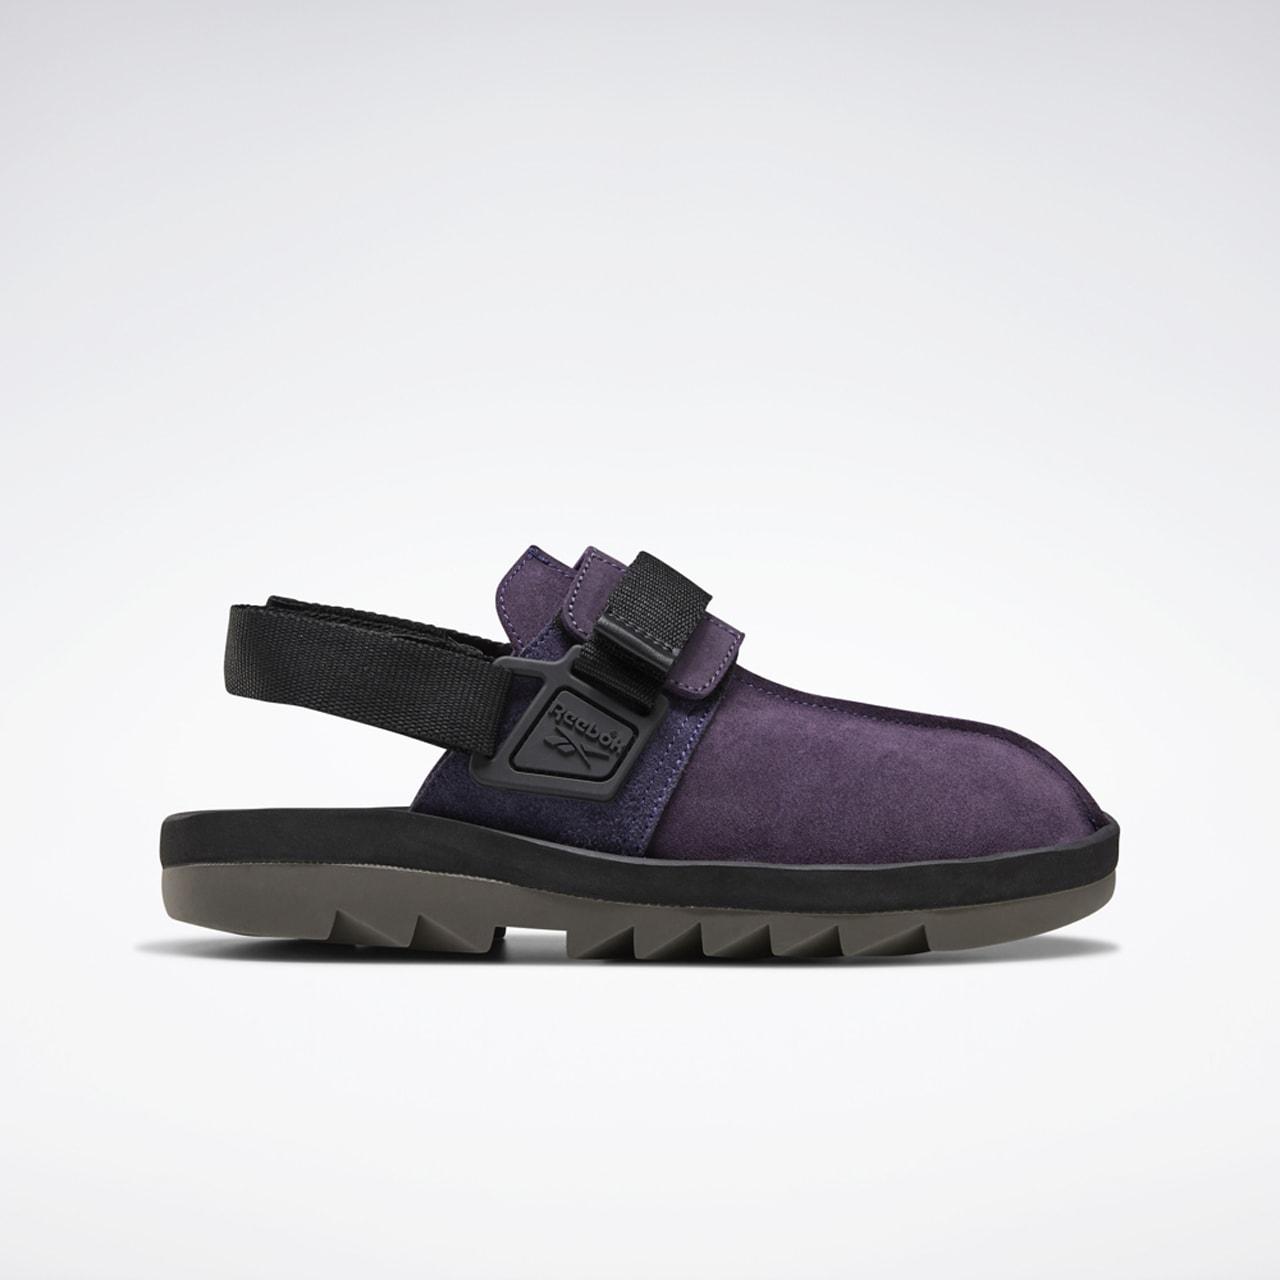 Reebok Beatnik Shoe History, Influence, Redesign nicole mclaughlin leo gamboa sneaker sandal colorway 2020